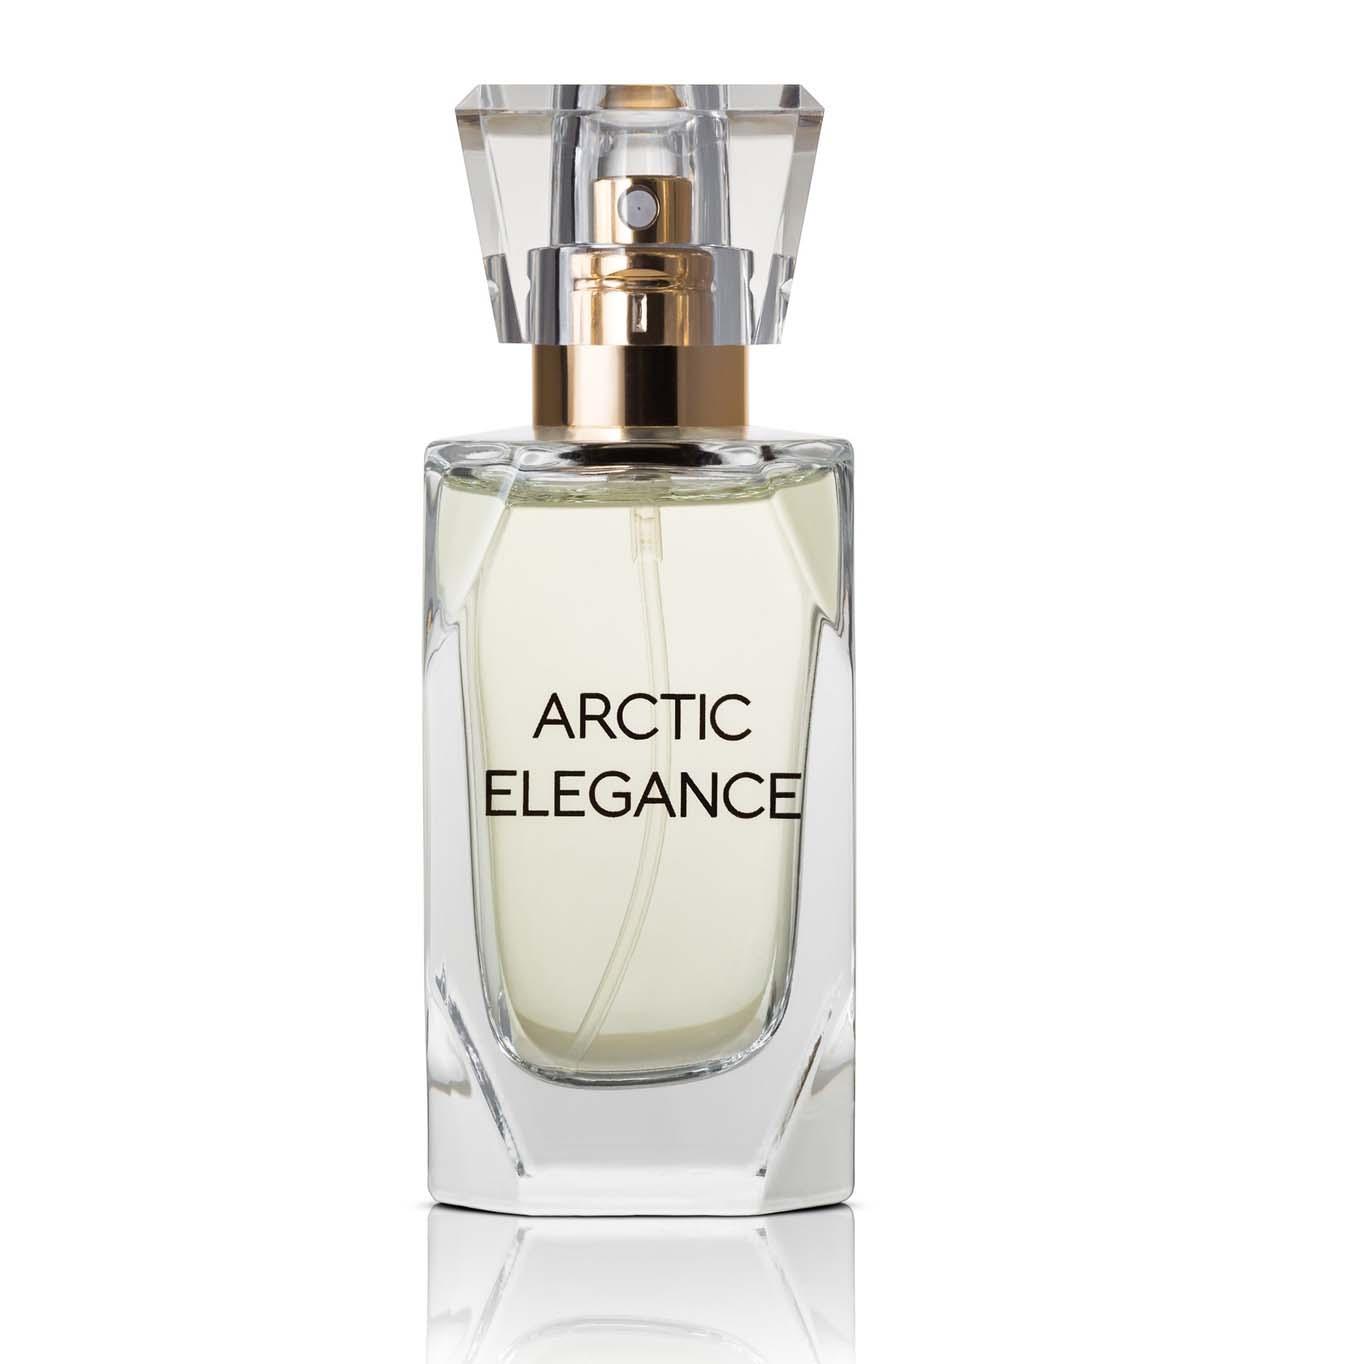 parfym som doftar liljekonvalj